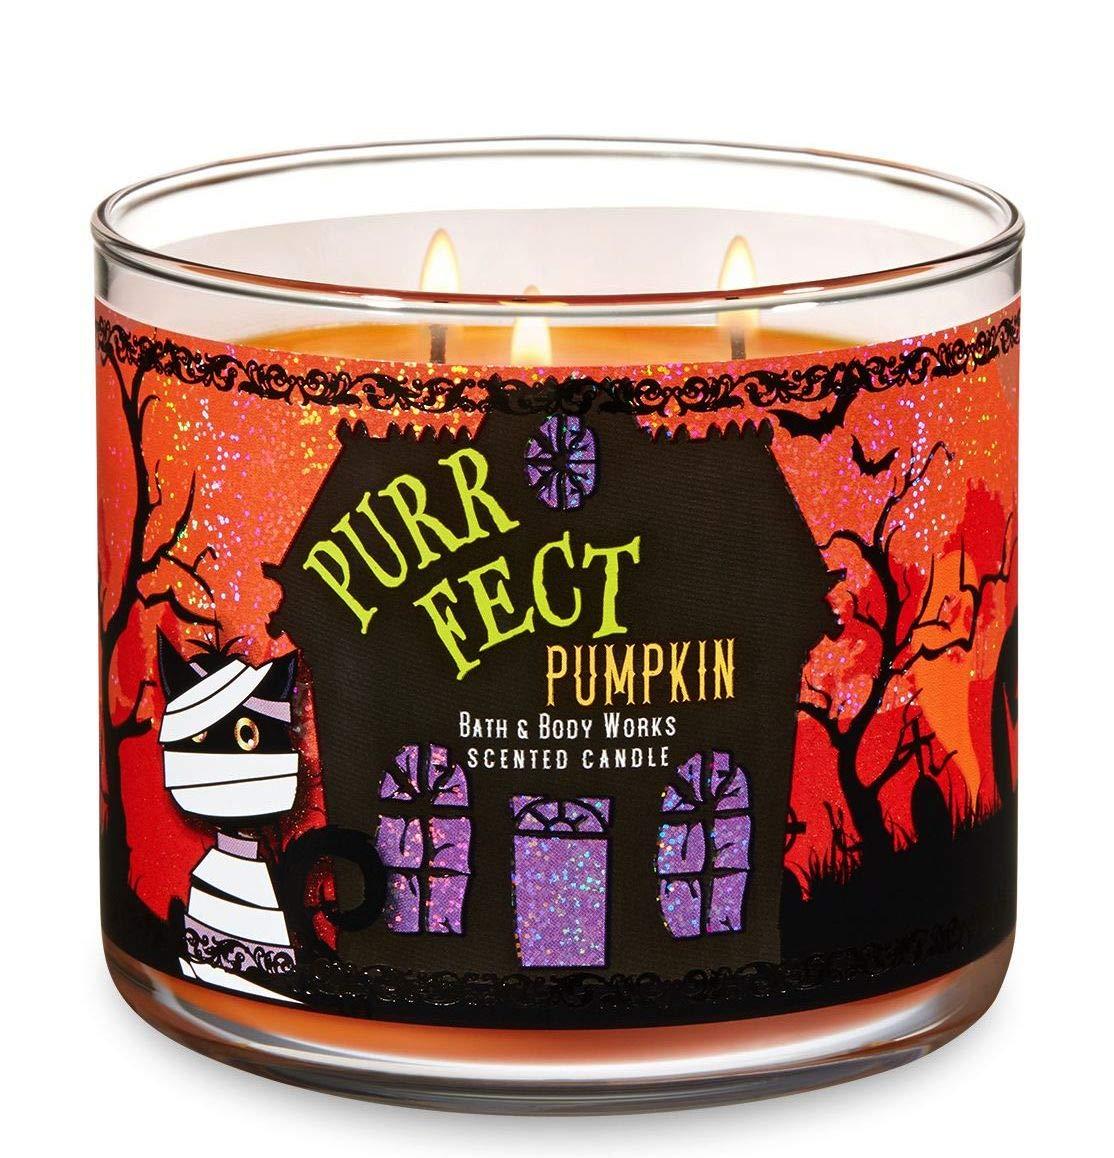 Bath & Body Works 'Purrfect Pumpkin' Halloween 3-Wick Candle - Sweet Cinnamon Pumpkin